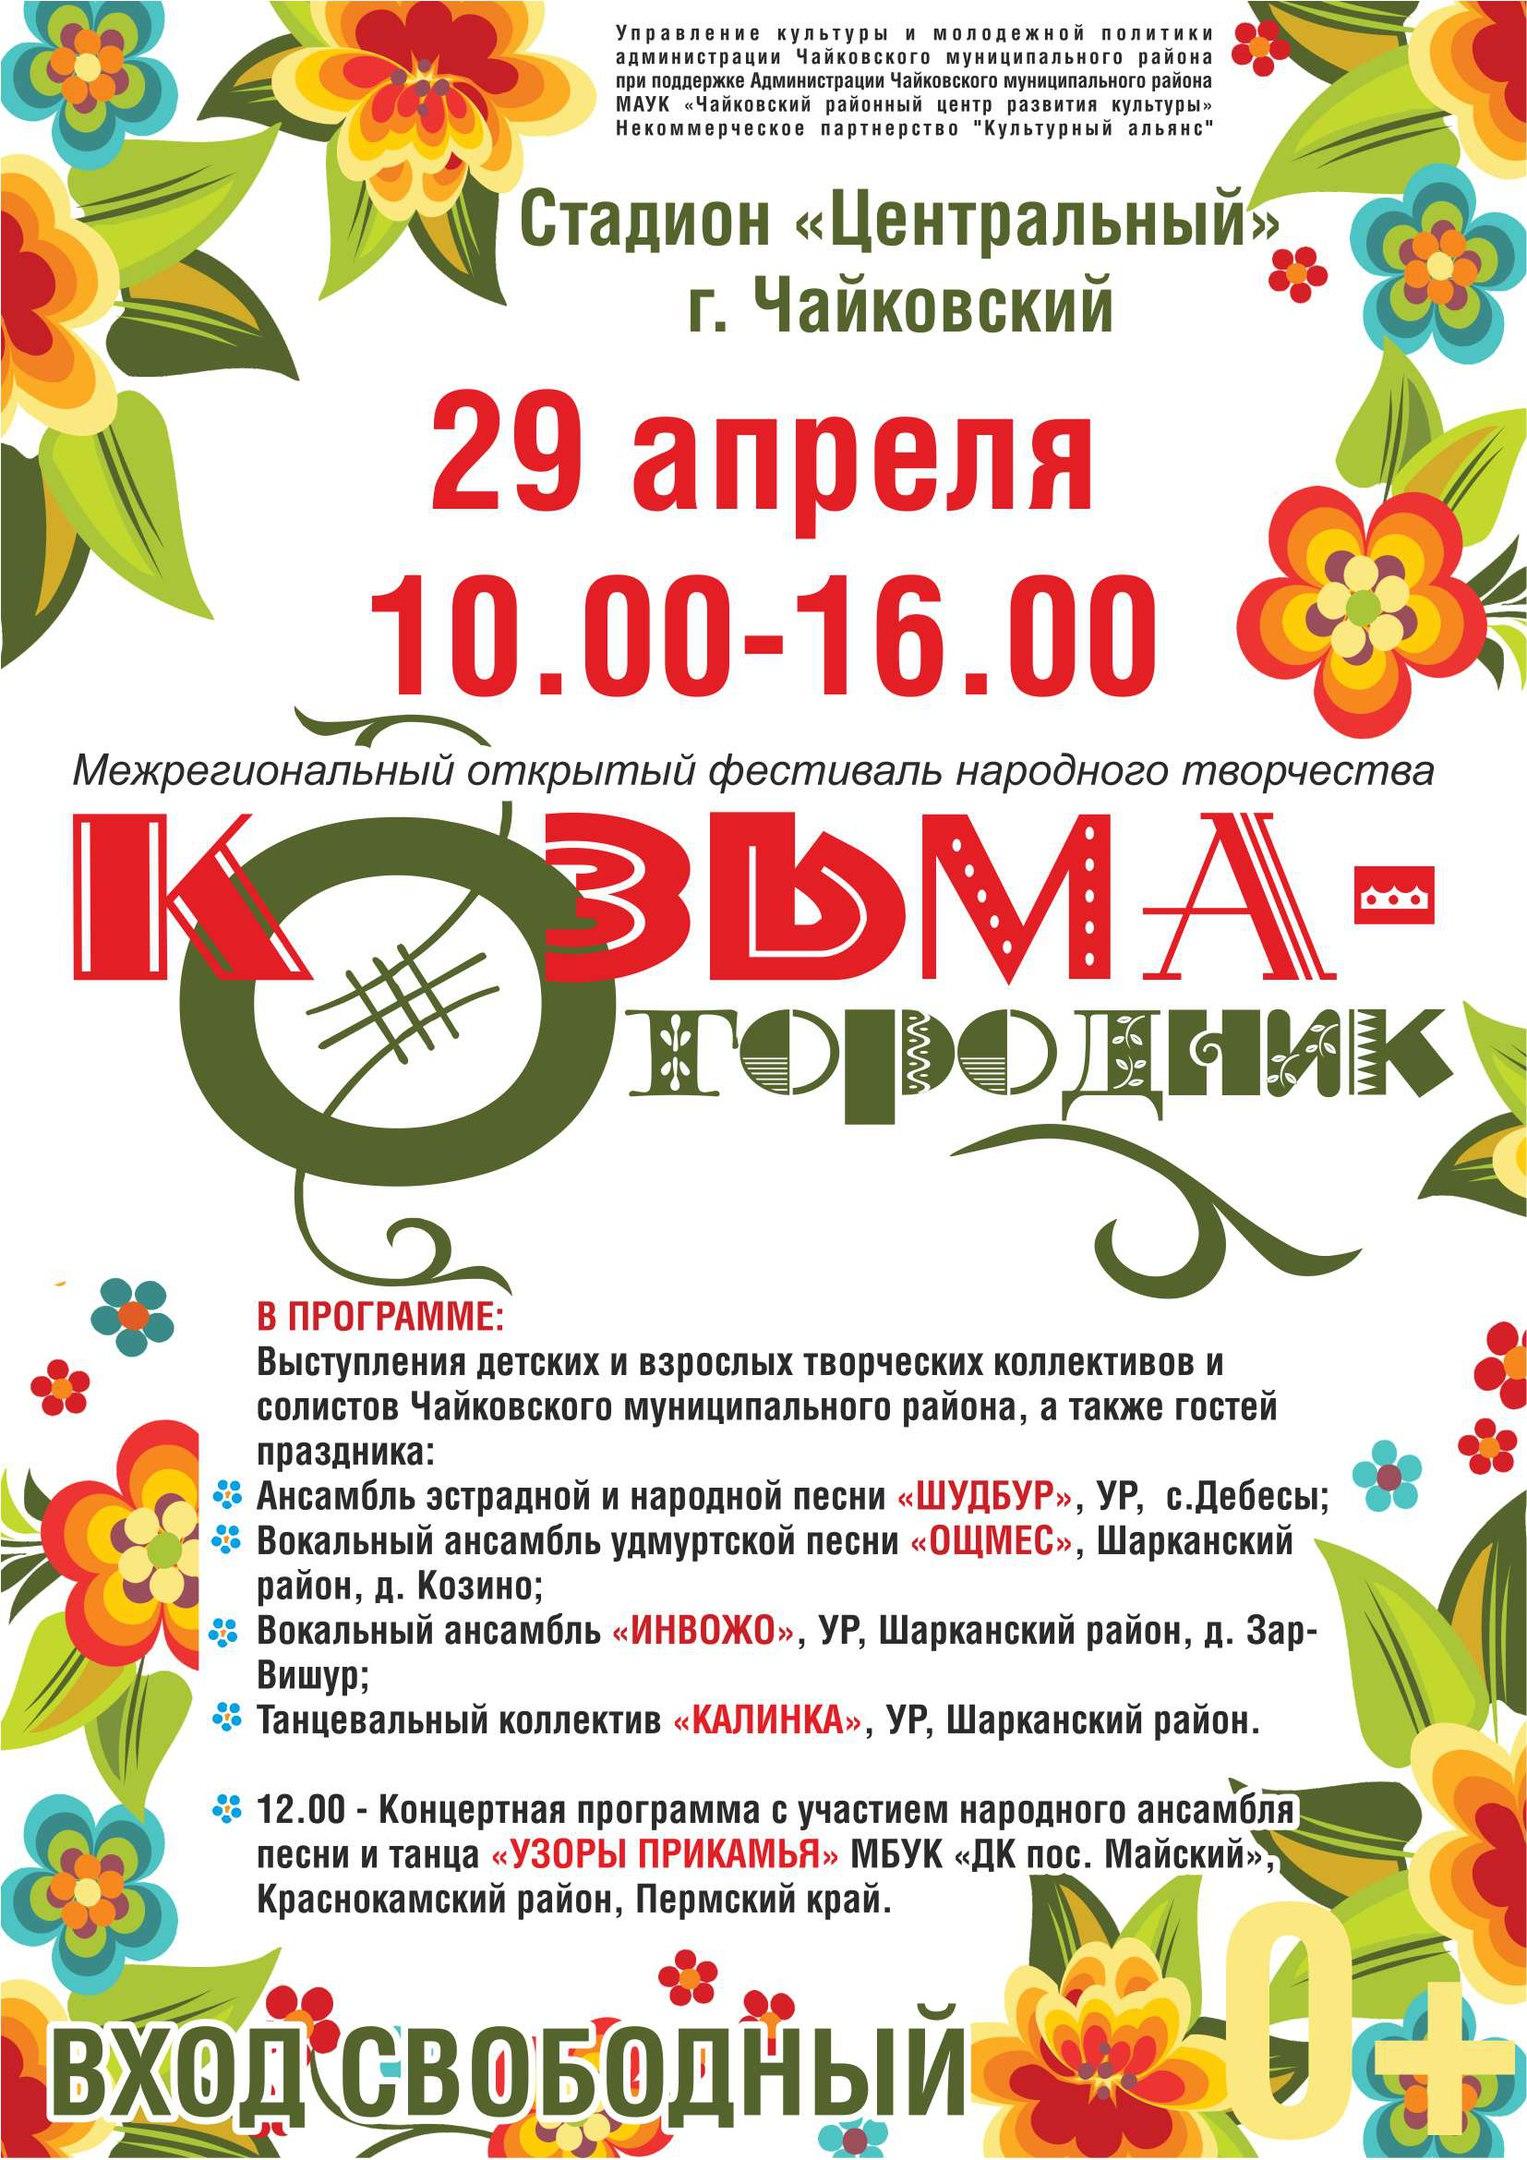 афиша, ярмарка, Чайковский, 2017 год